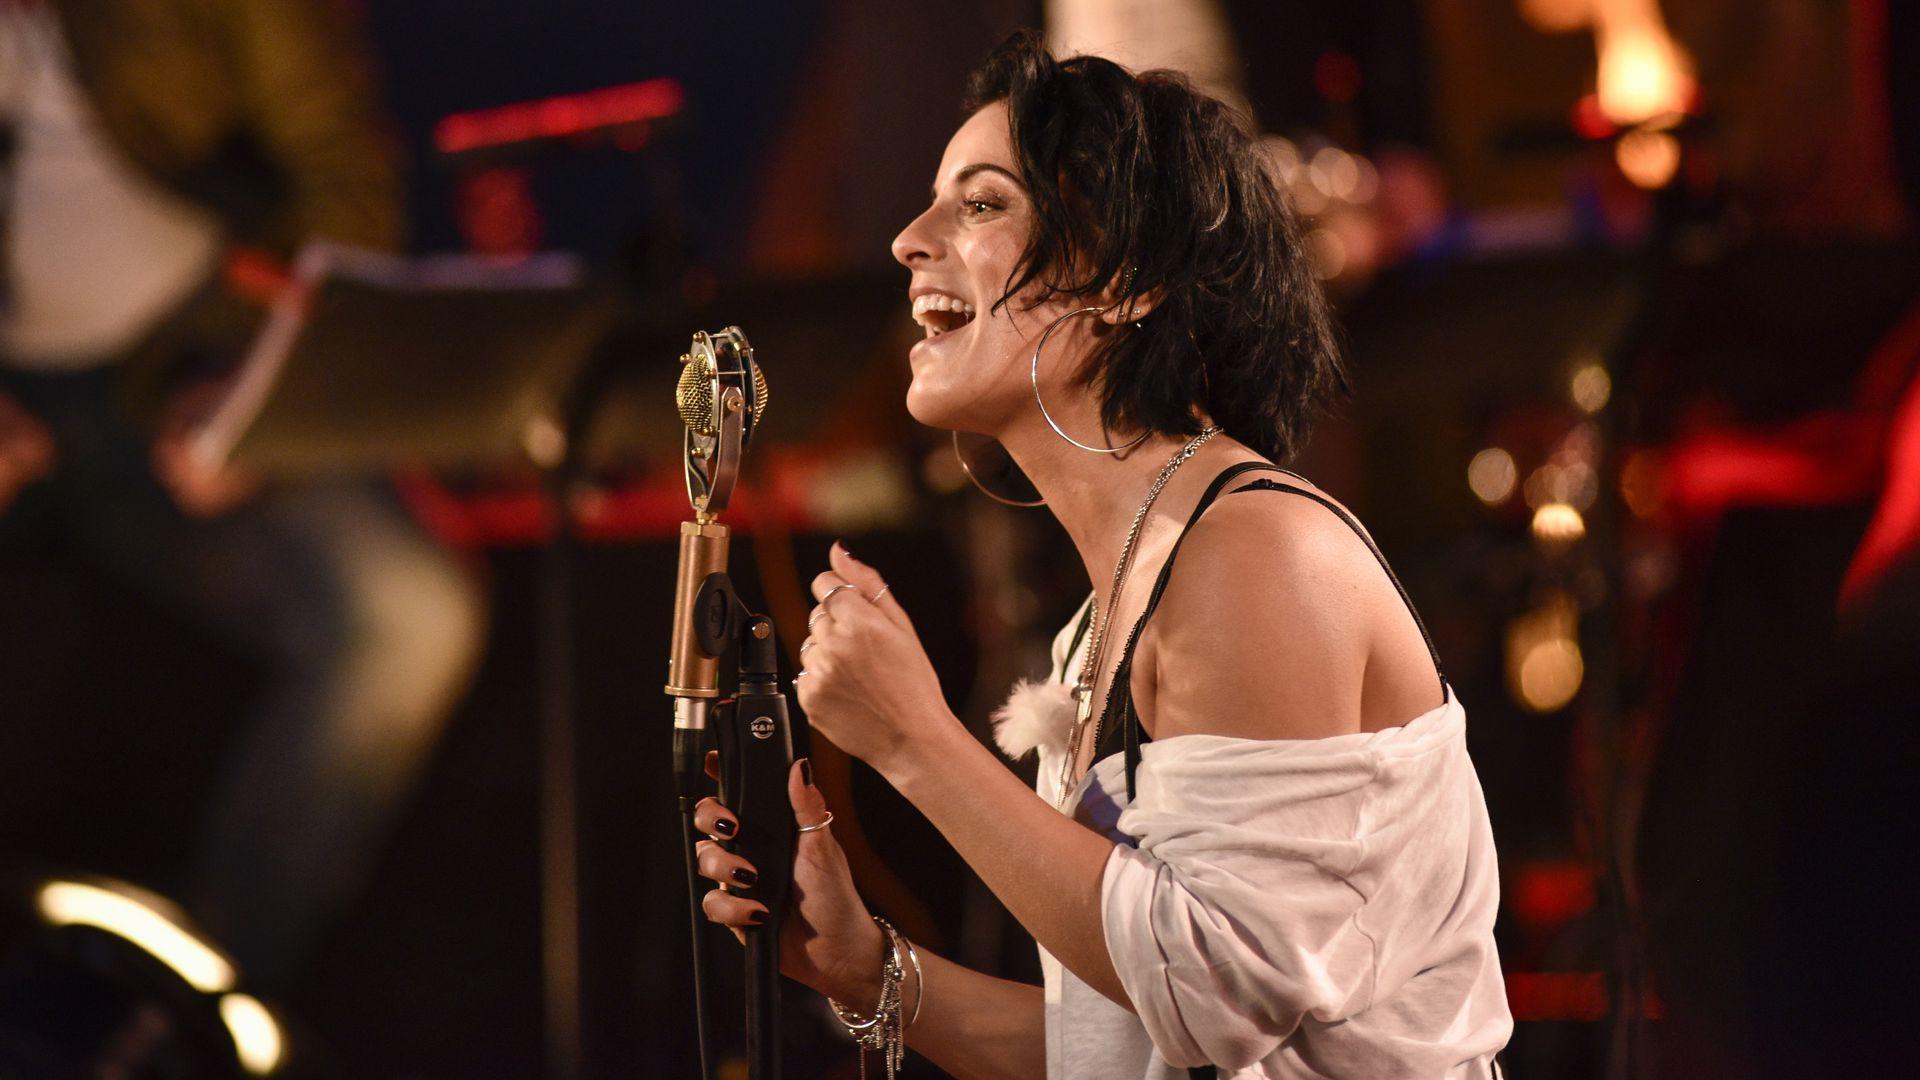 Sing Meinen Song Wiedersehen Steffi Saß In Lenas Esc Jury